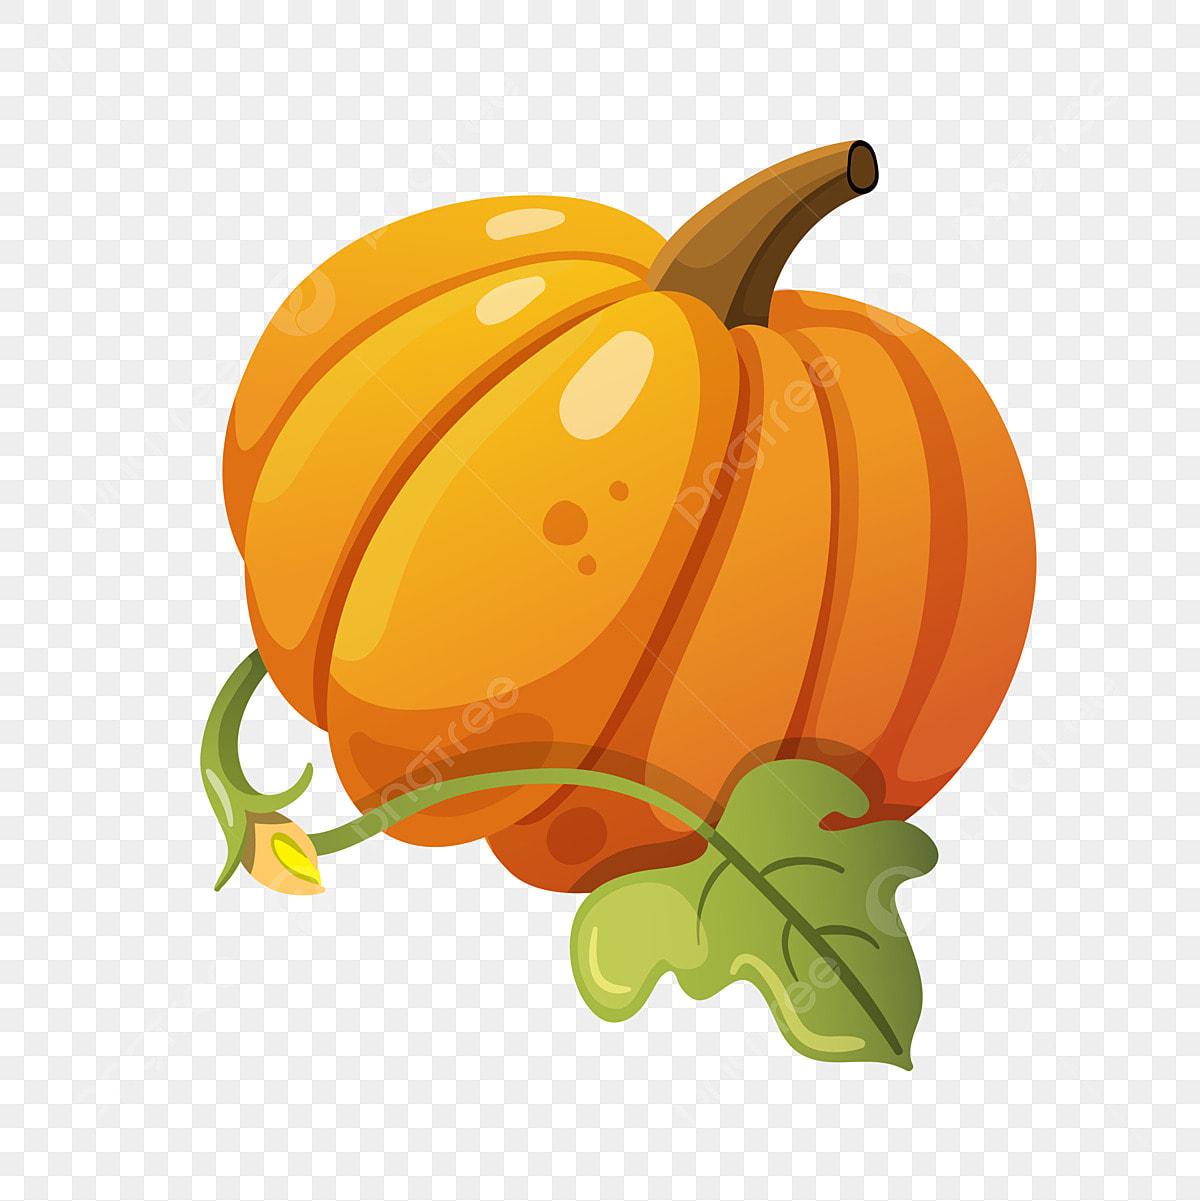 Halloween Pumpkin Cartoon Images.Beginning Of Autumn Autumn Pumpkin Summer Pumpkin Halloween